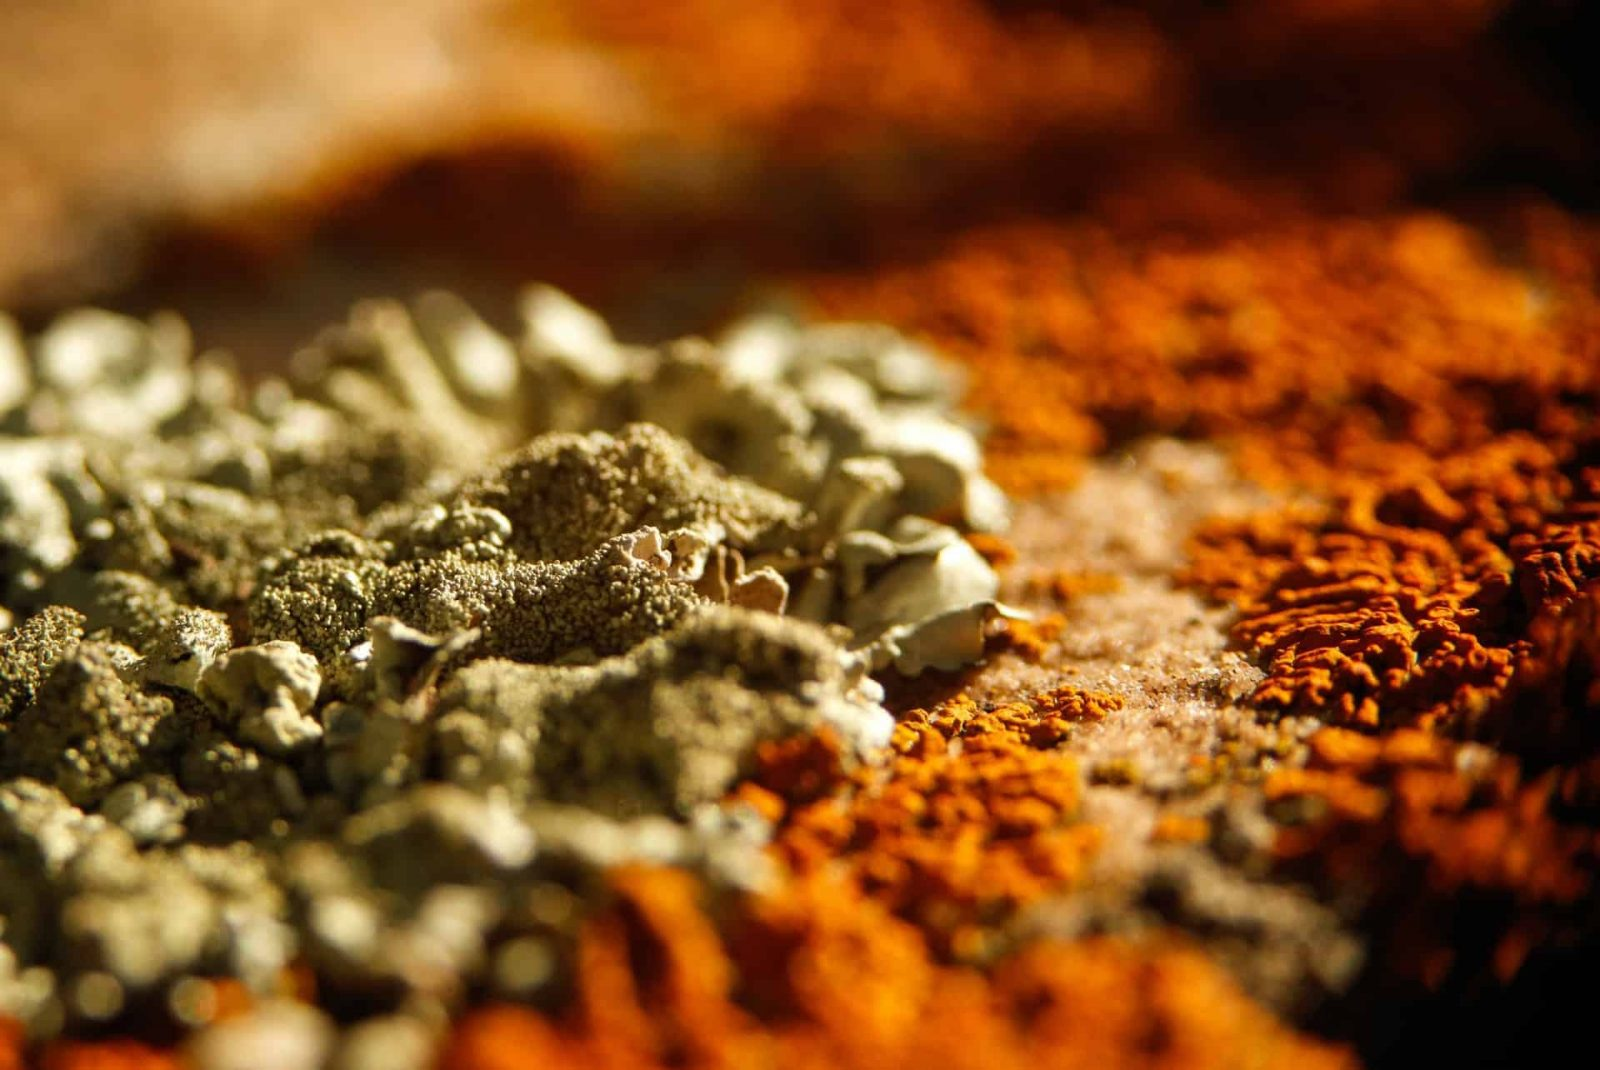 orange mold close up